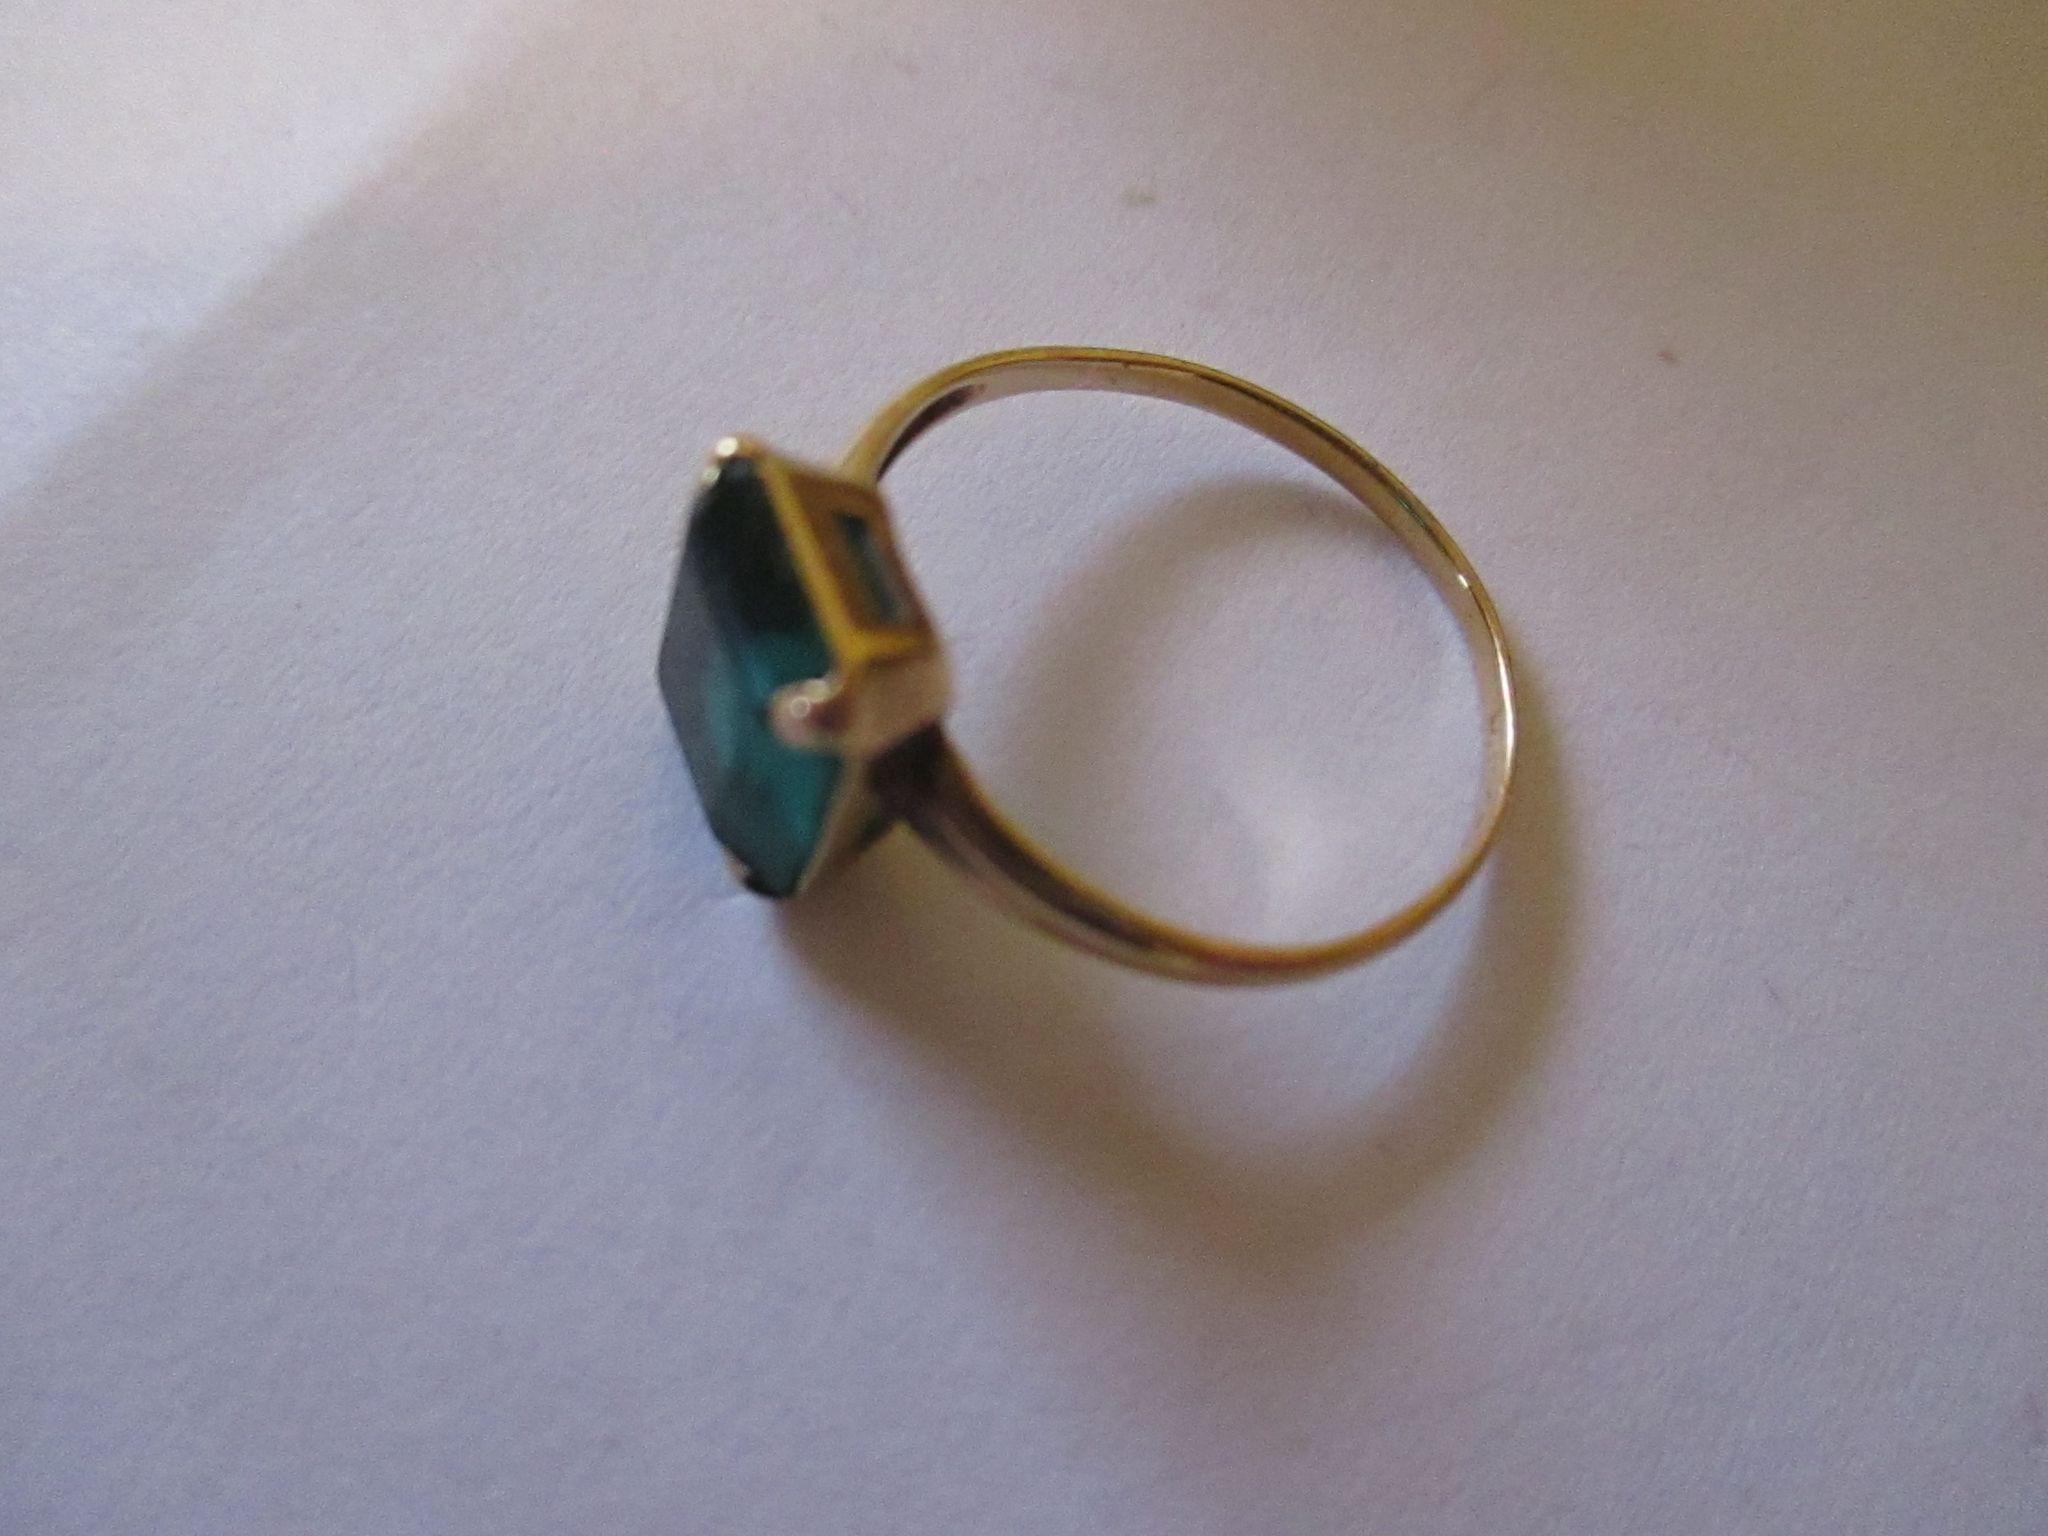 Vintage 10K PSCO Synthetic Emerald Ring Original